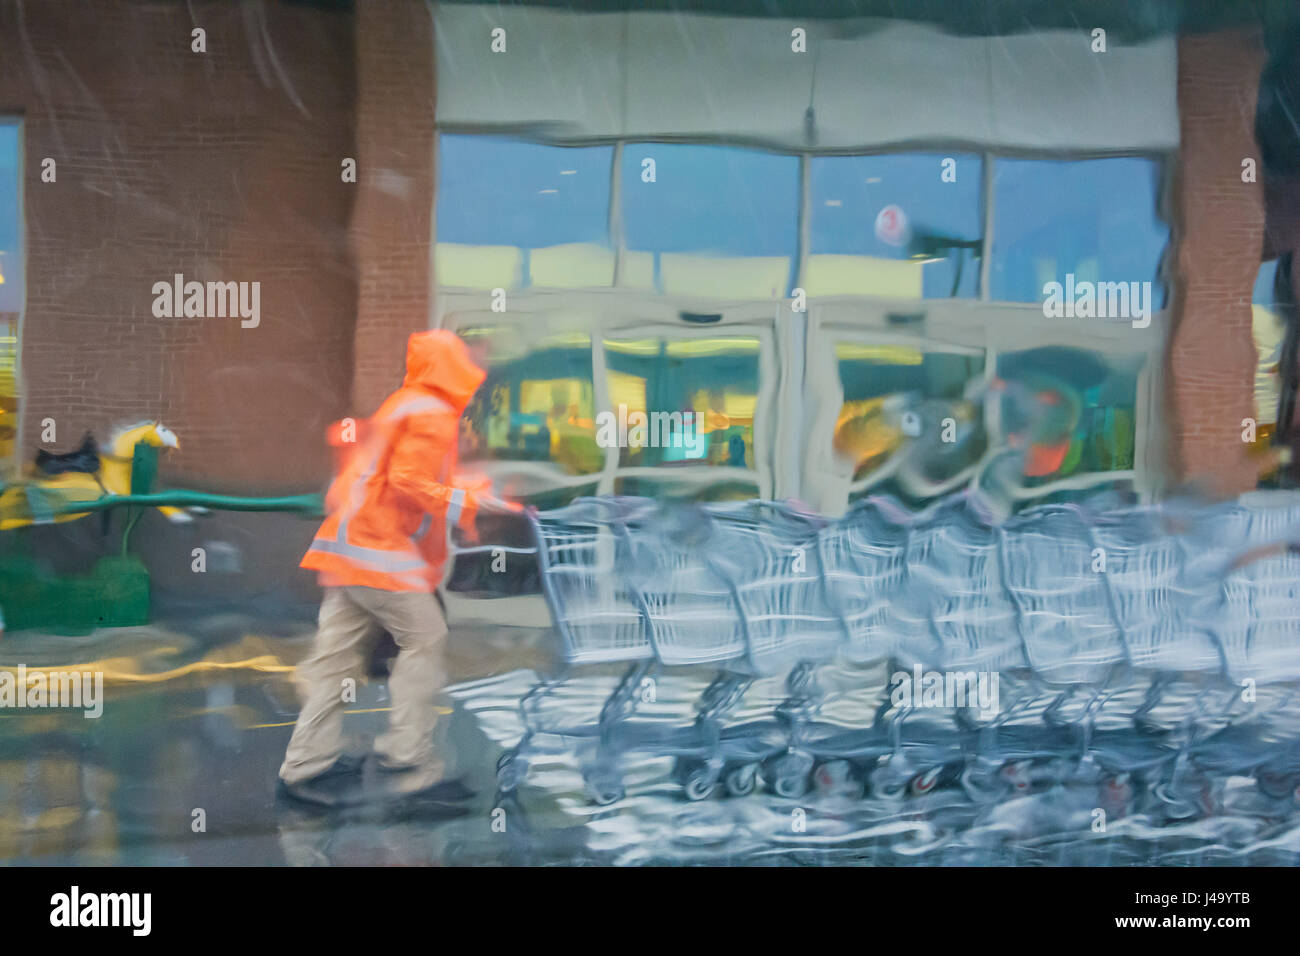 Rain warped view of parking lot attendant pushing shopping carts back to store - Stock Image